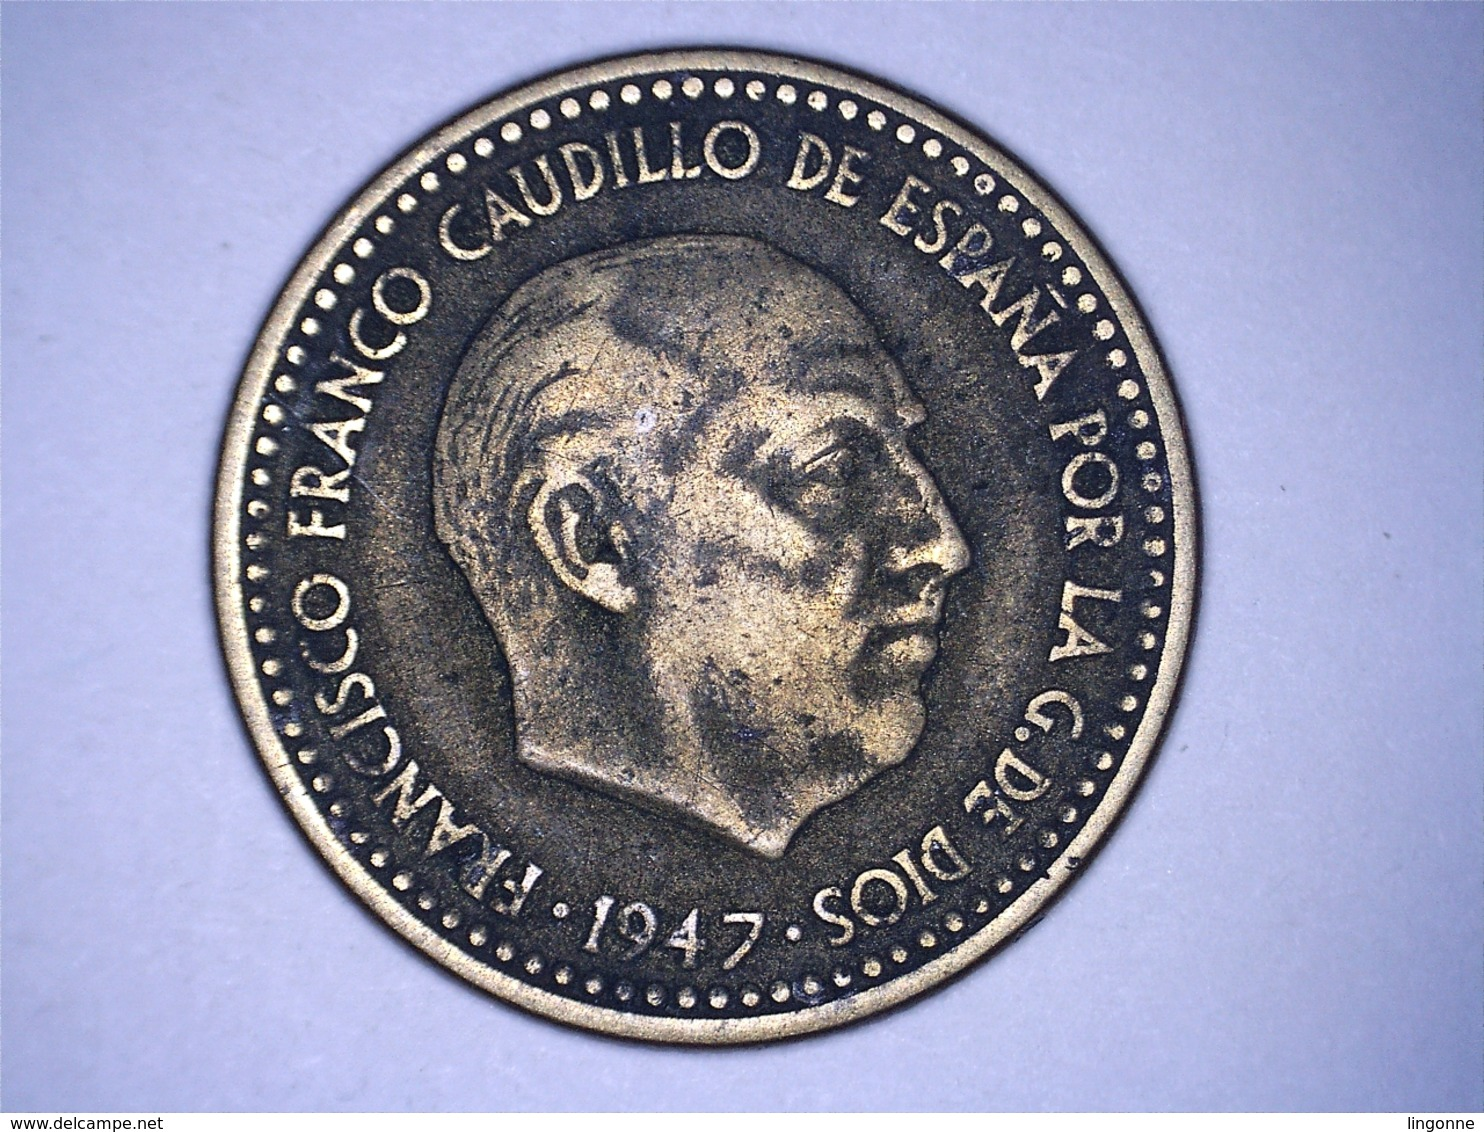 1947 - Espagne - Spain - UNA PESETA, ETOILE 54 - 1 Peseta